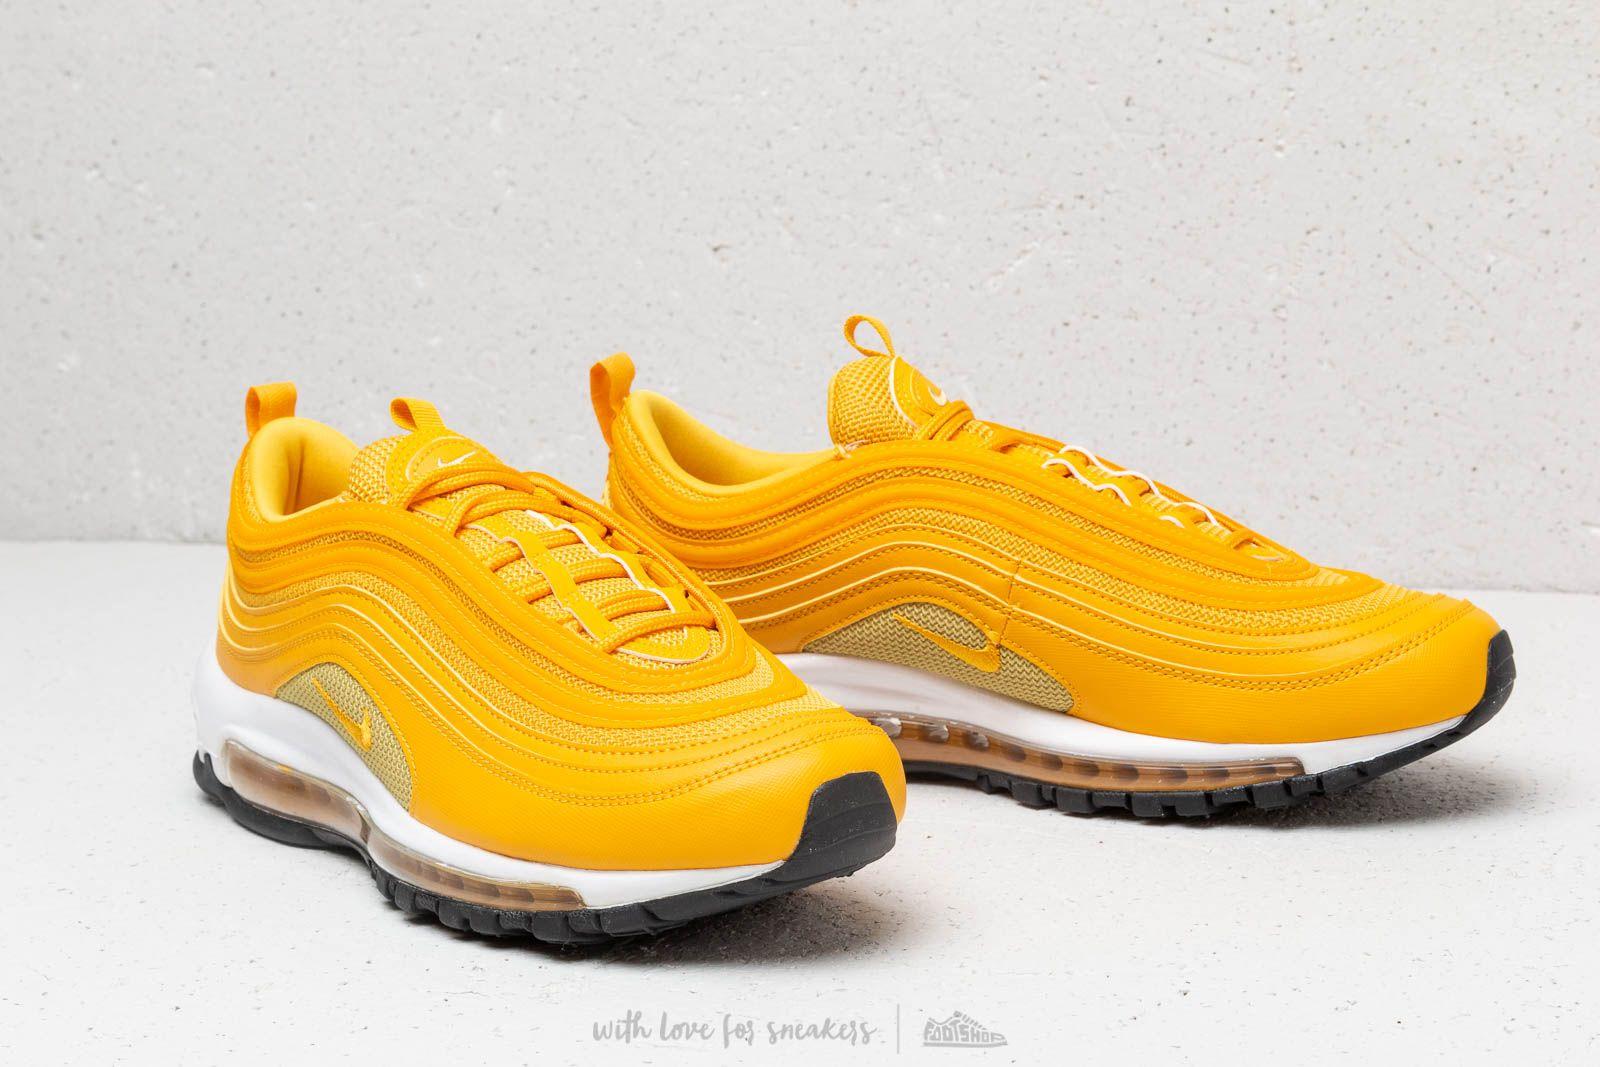 Nike Air Max 97 Wm's Mustard Mustard Buff Gold | Footshop